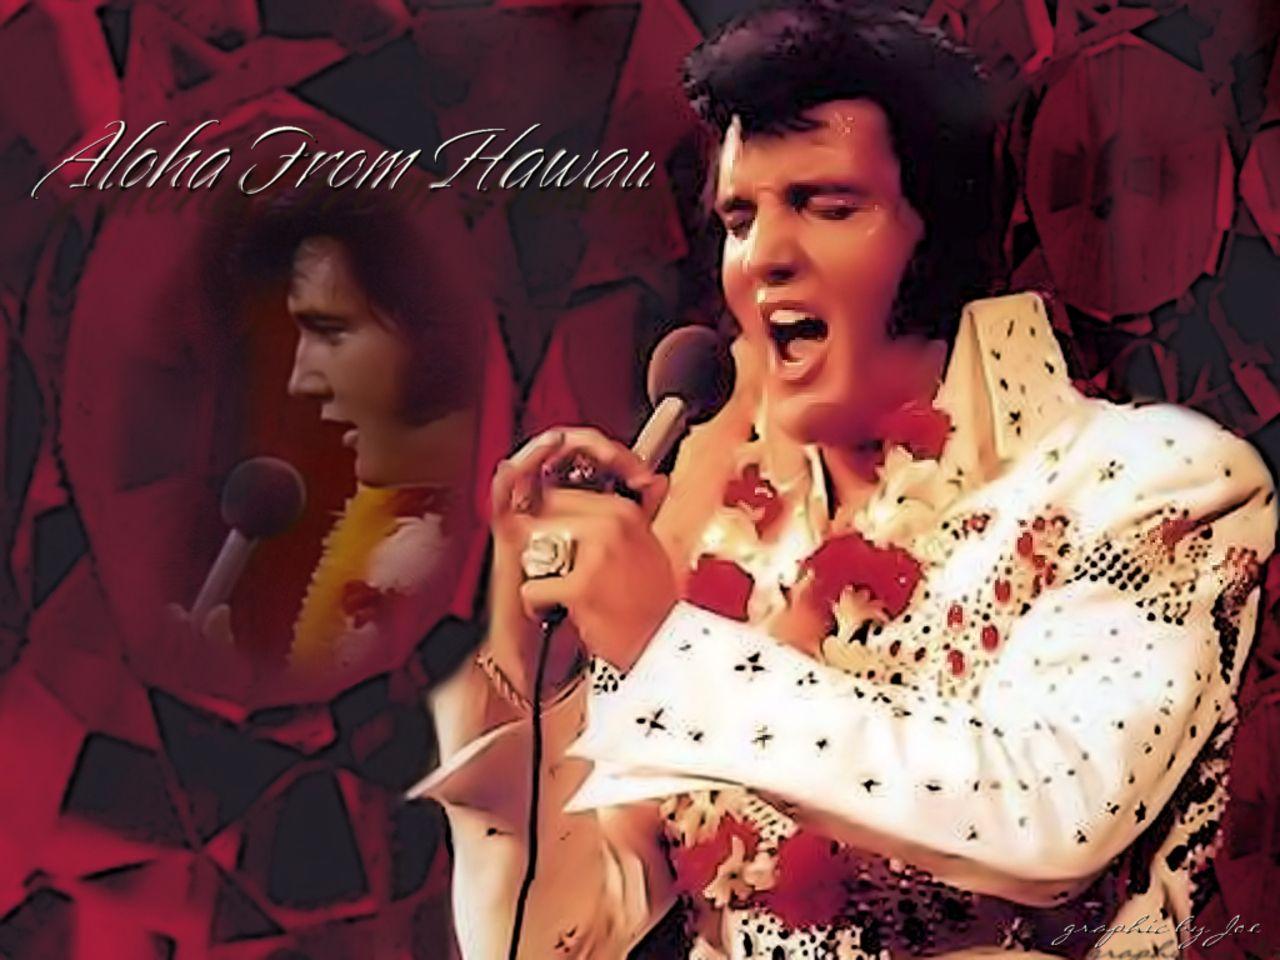 Elvis Presley Wallpaper Google Search Elvis Presley